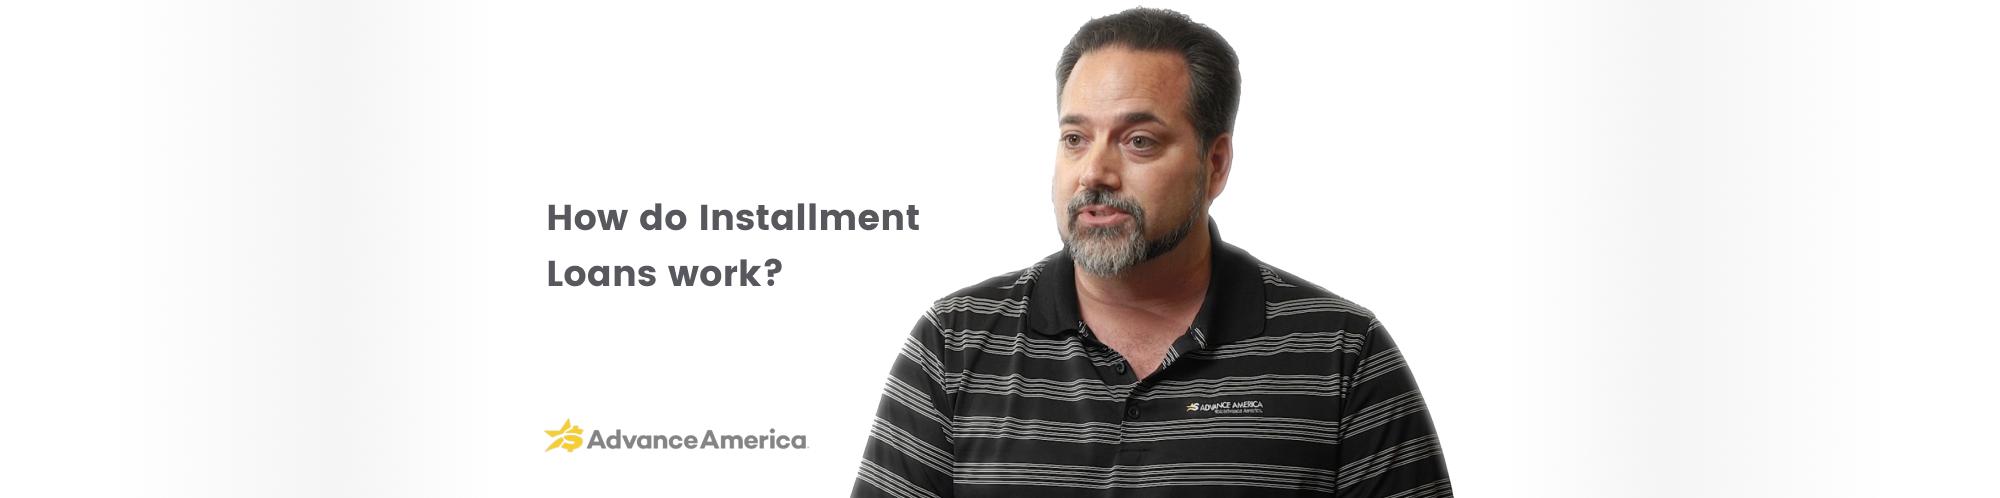 Benefits of Installment Loans